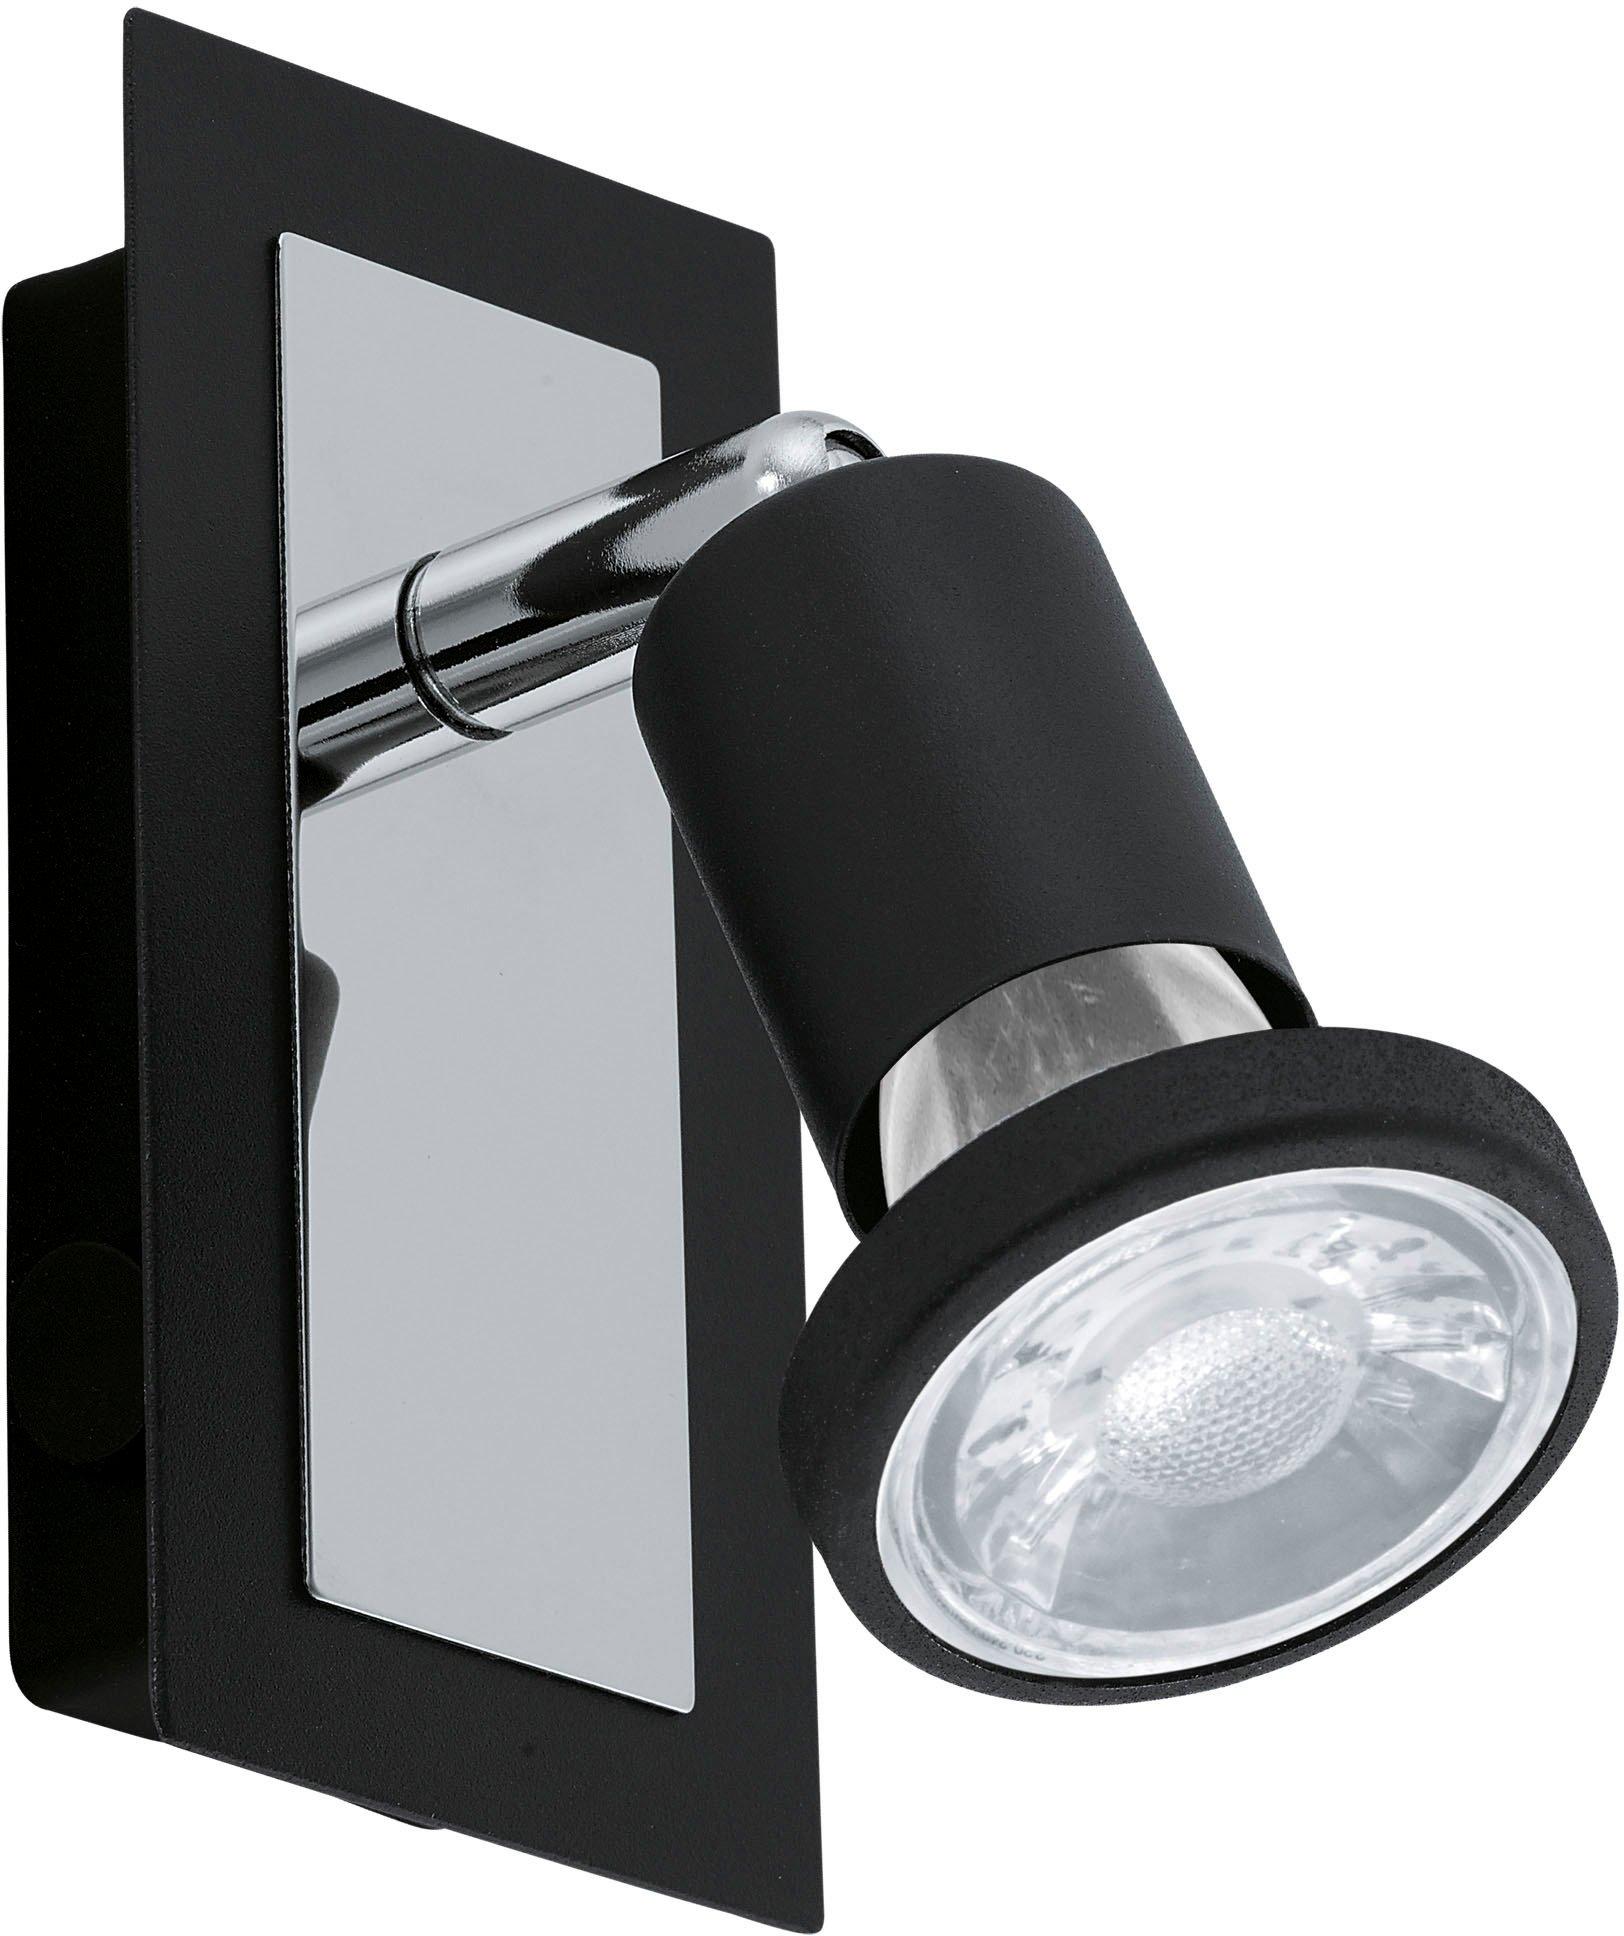 EGLO led-wandlamp SARRIA - verschillende betaalmethodes